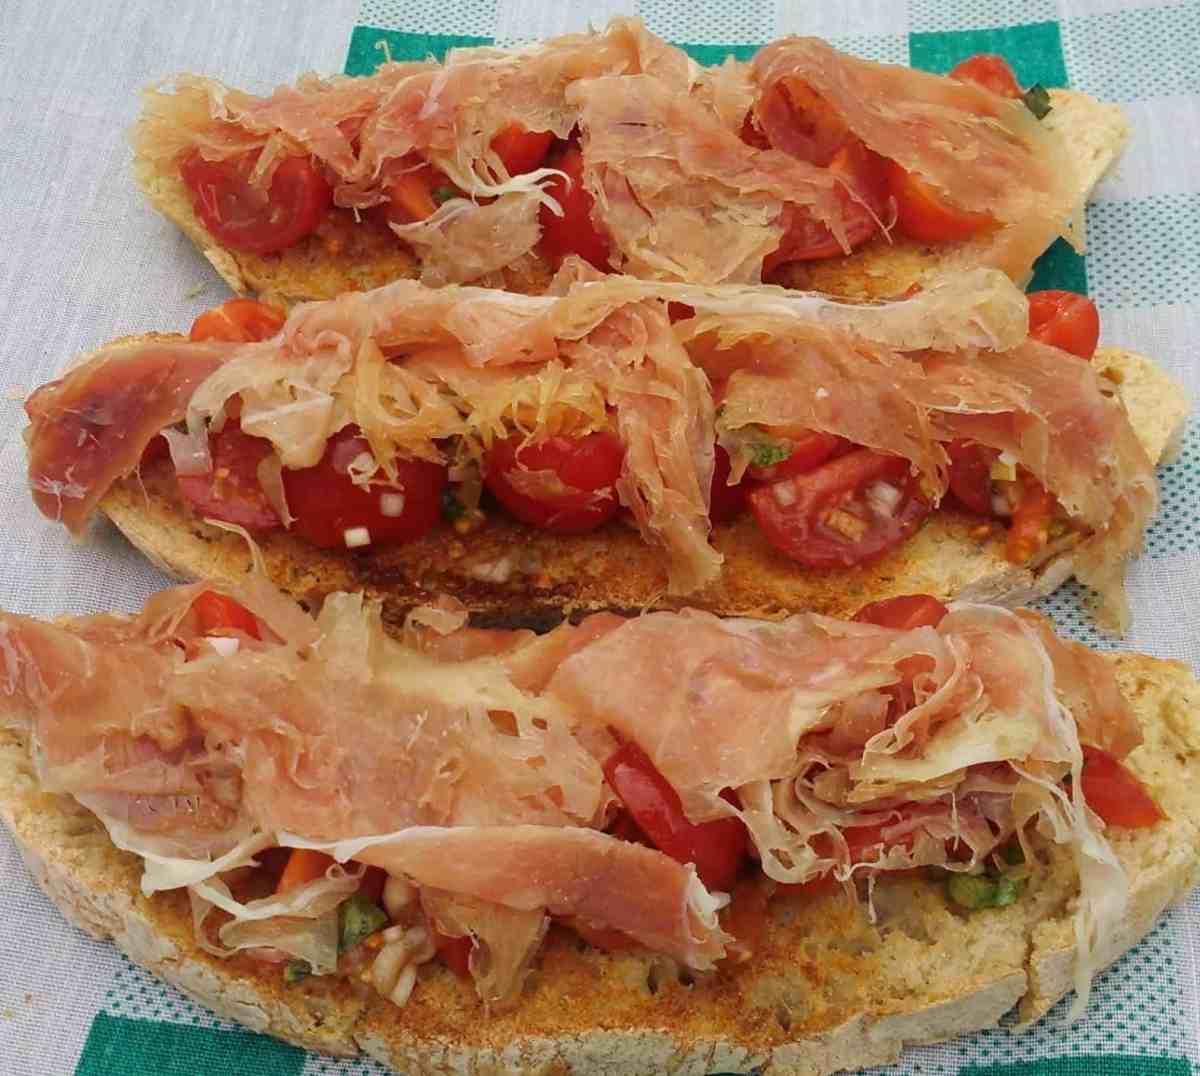 Bruschetta com tomate, manjericão e presunto